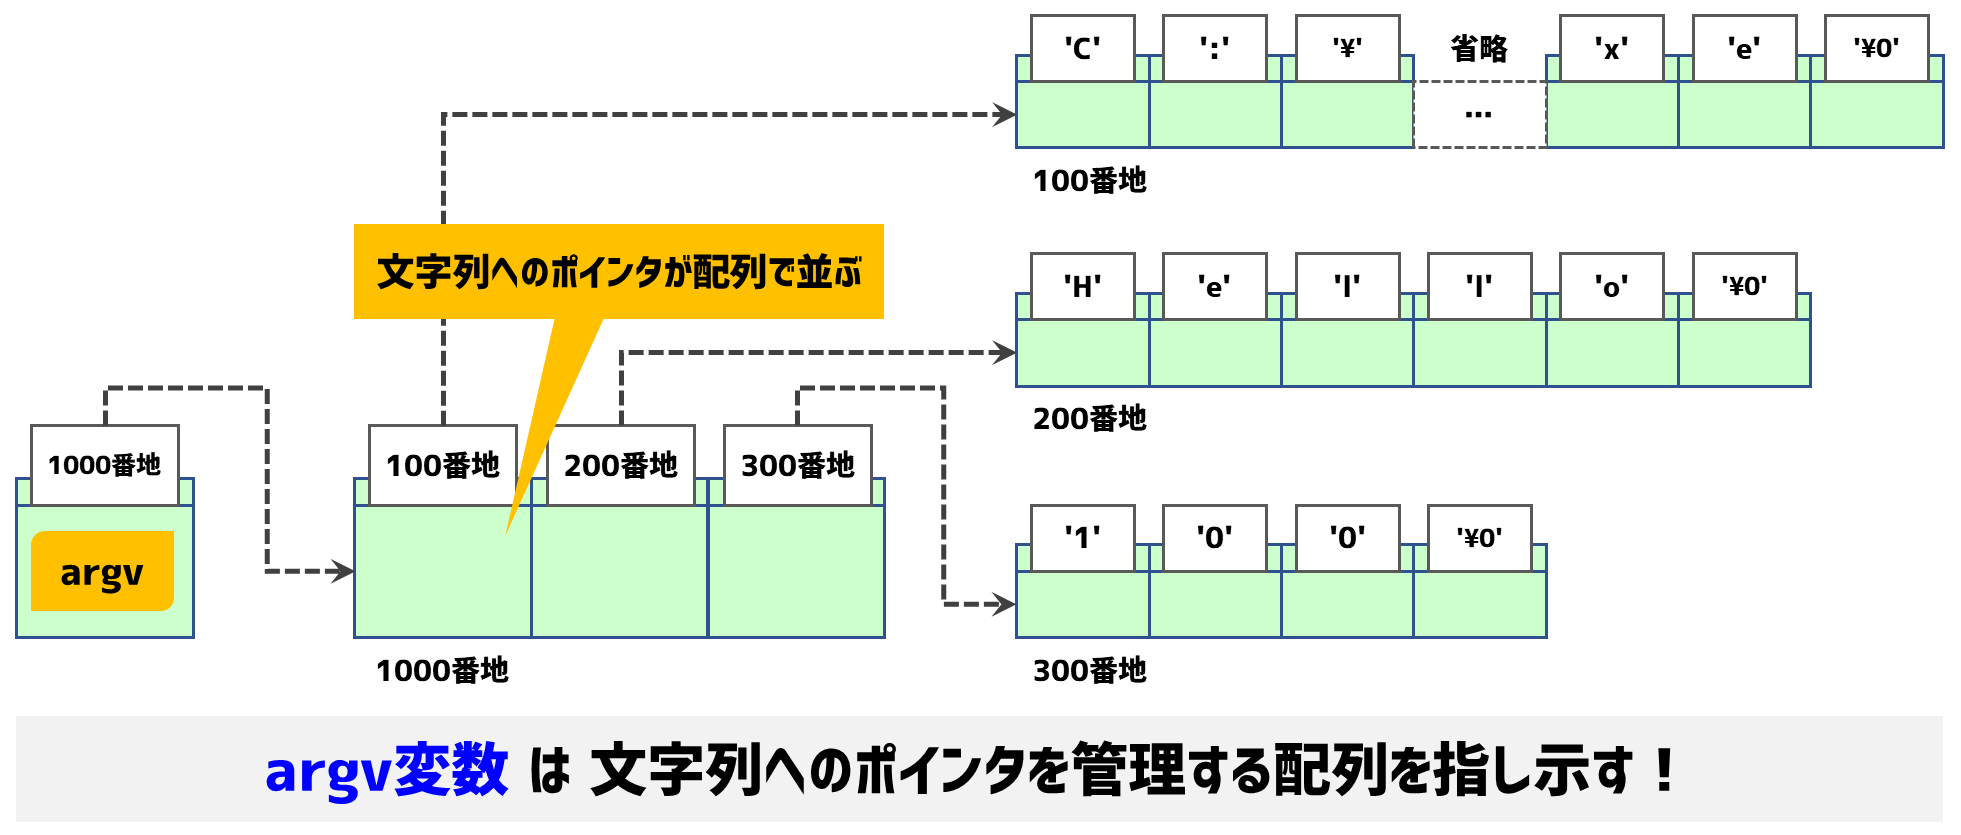 argvのデータ構造